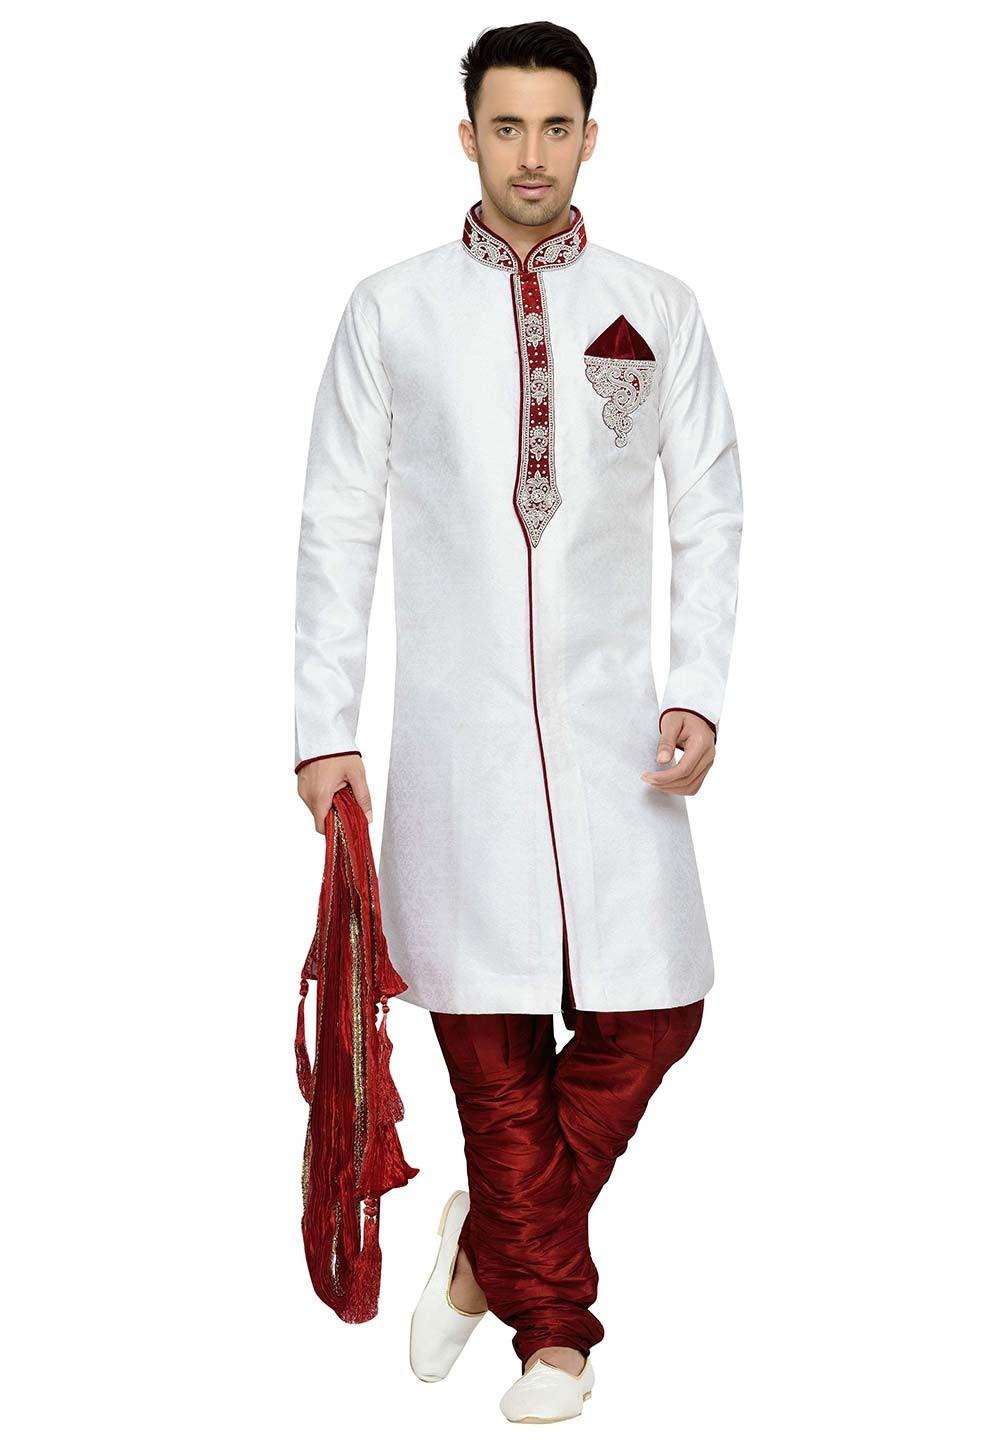 Off White Color Brocade Fabric Party Wear Kurta Pyjama.